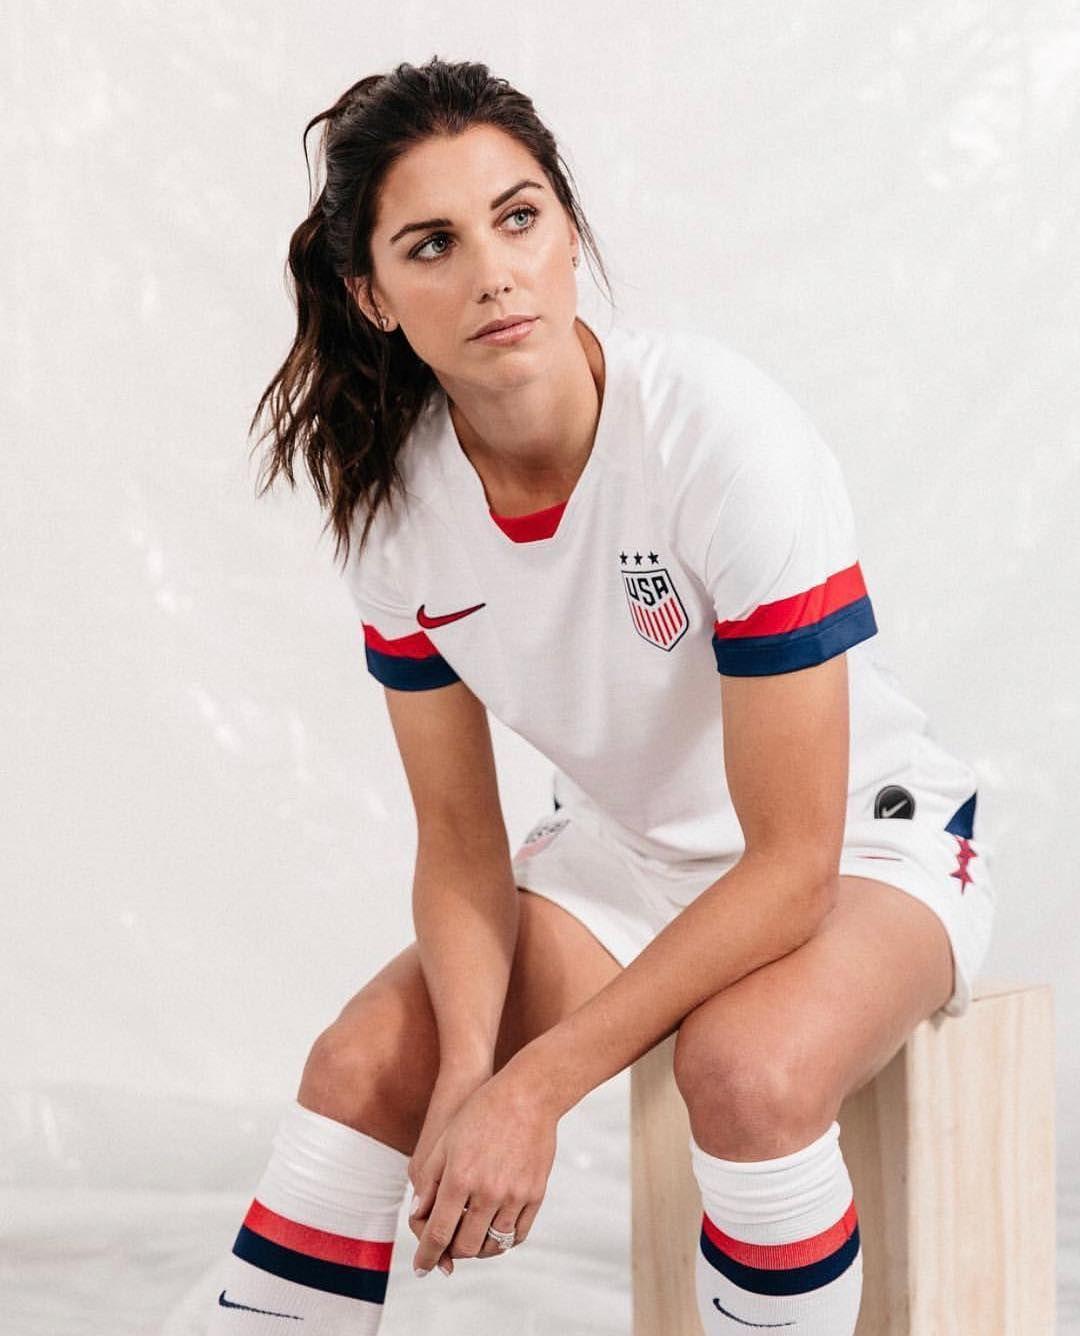 Fan Alex Morgan On Instagram For Country Via Hanaasano Kickstothepitch Soccer Uswnt Nike Usa Soccer Women Women S Soccer Alex Morgan